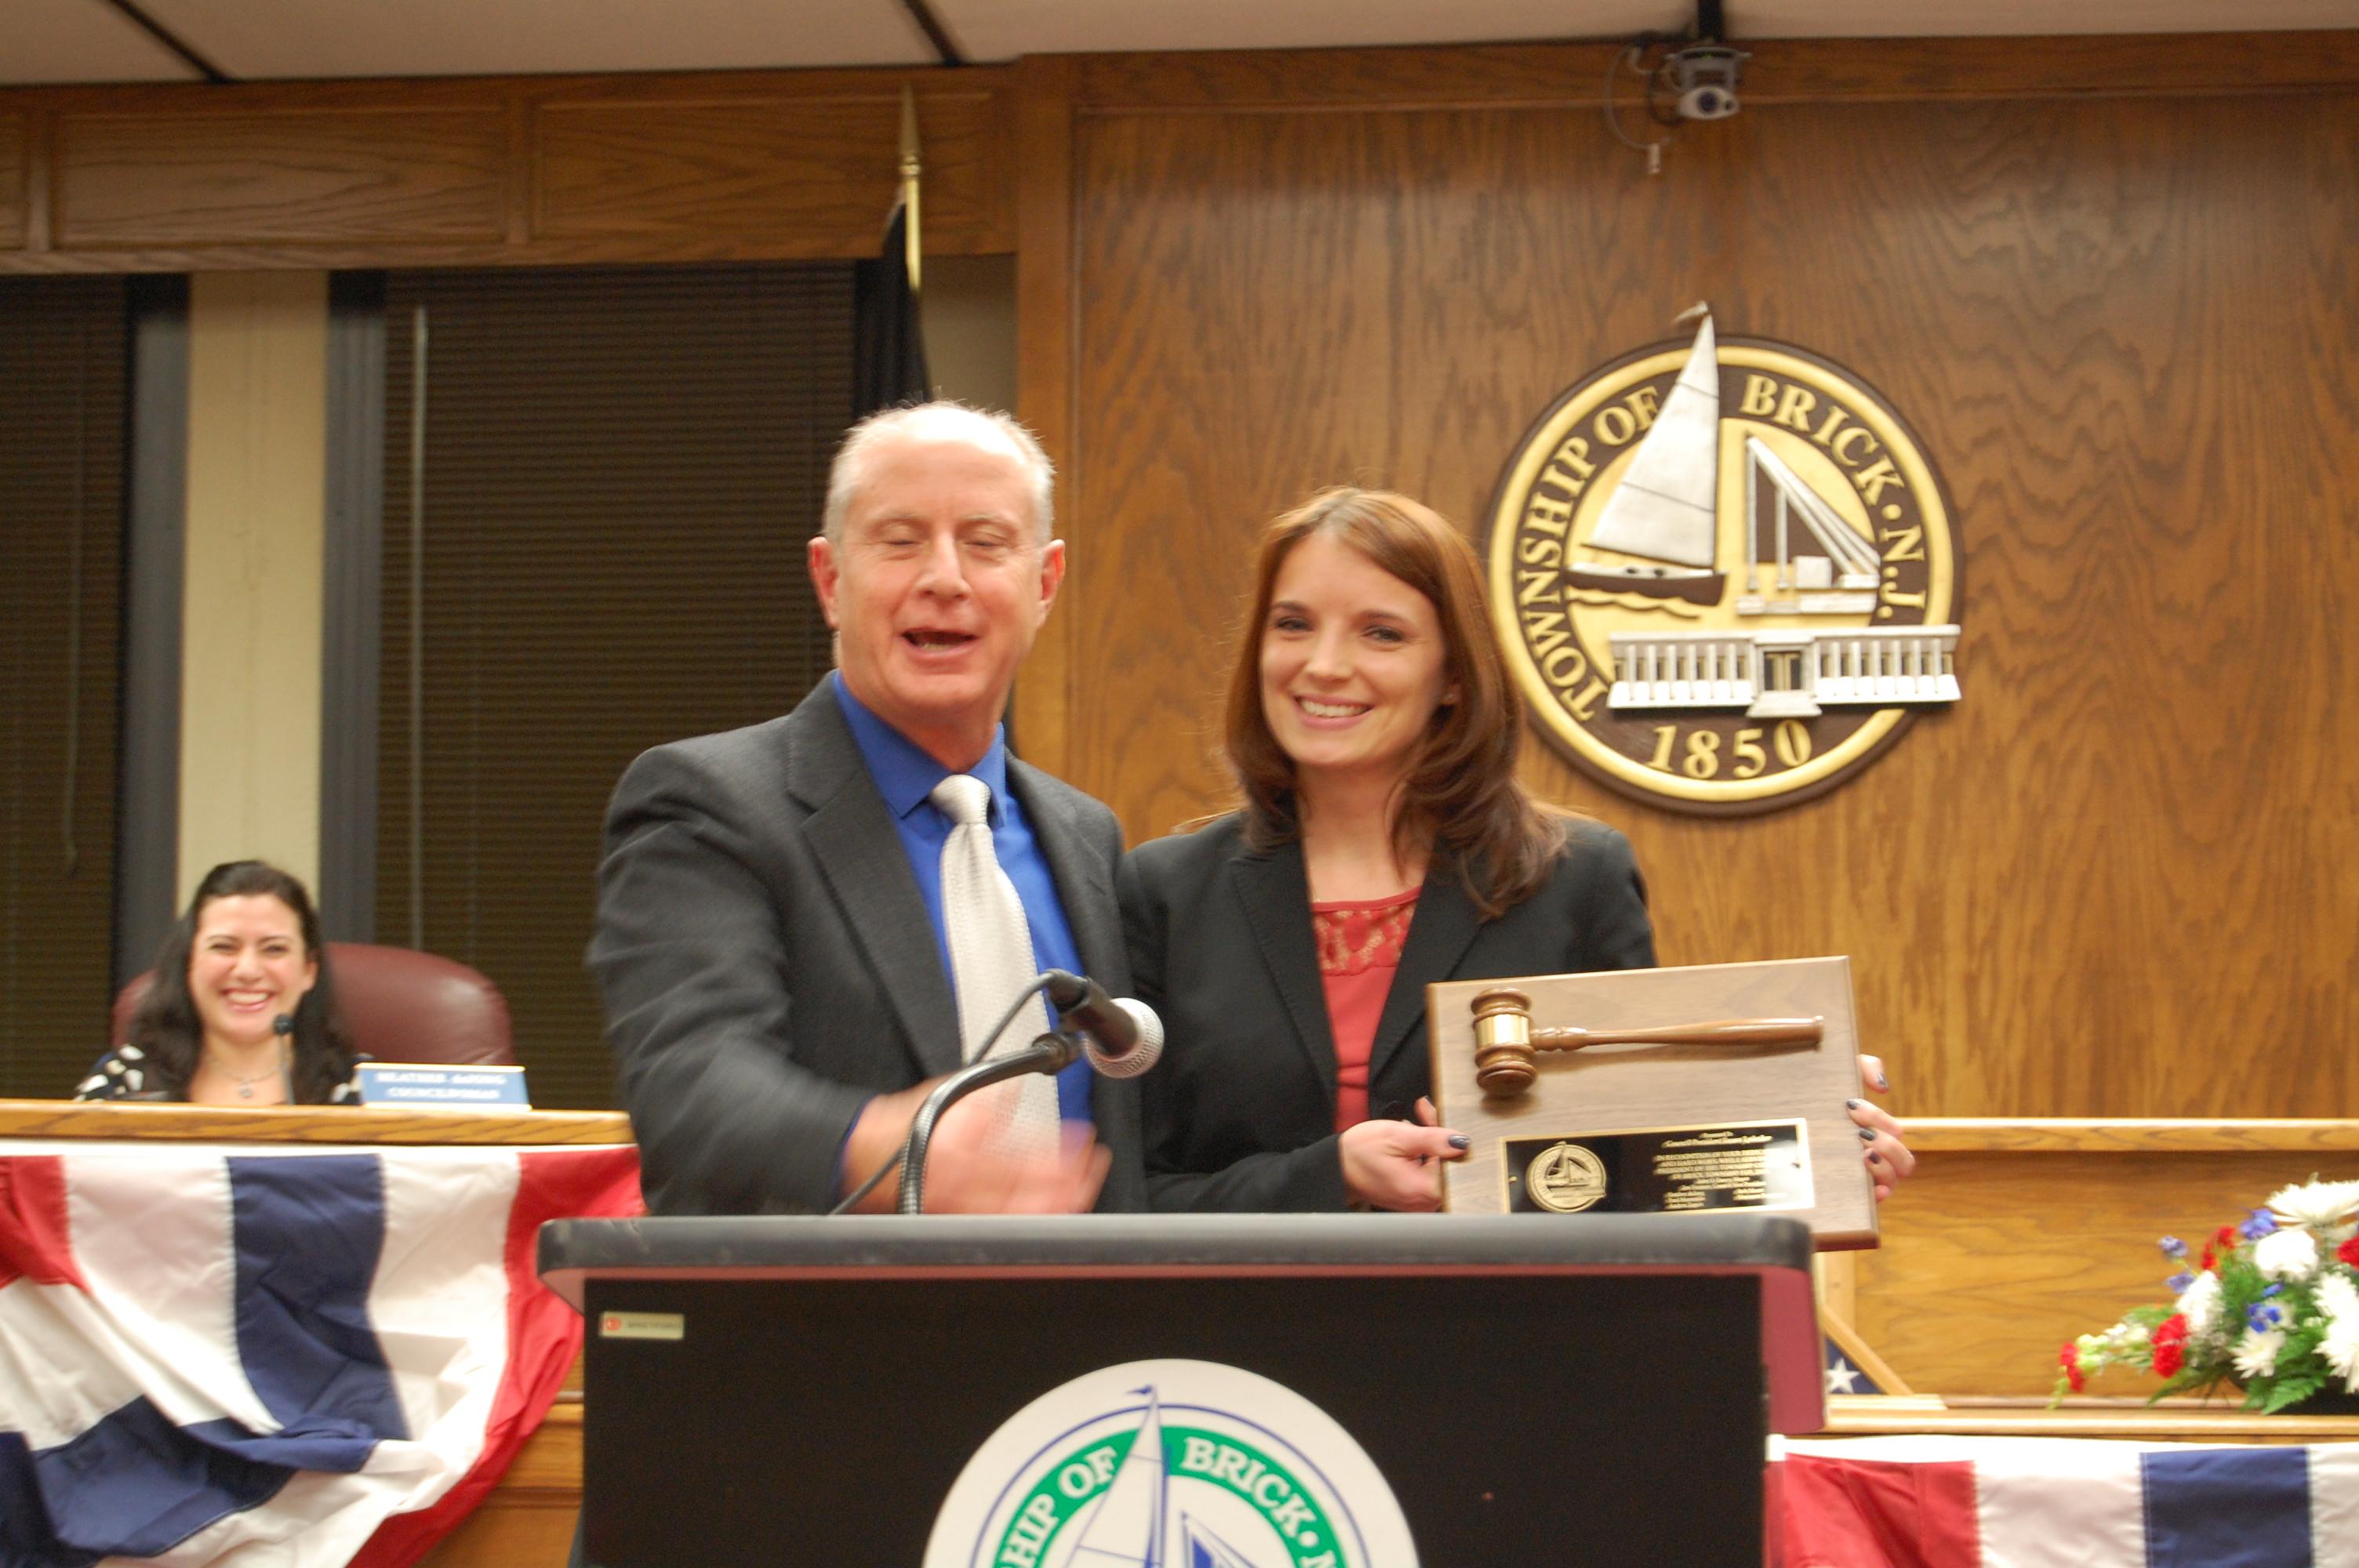 New council president Paul Mummolo thanks his predecessor, Susan Lydecker. (Photo: Daniel Nee)